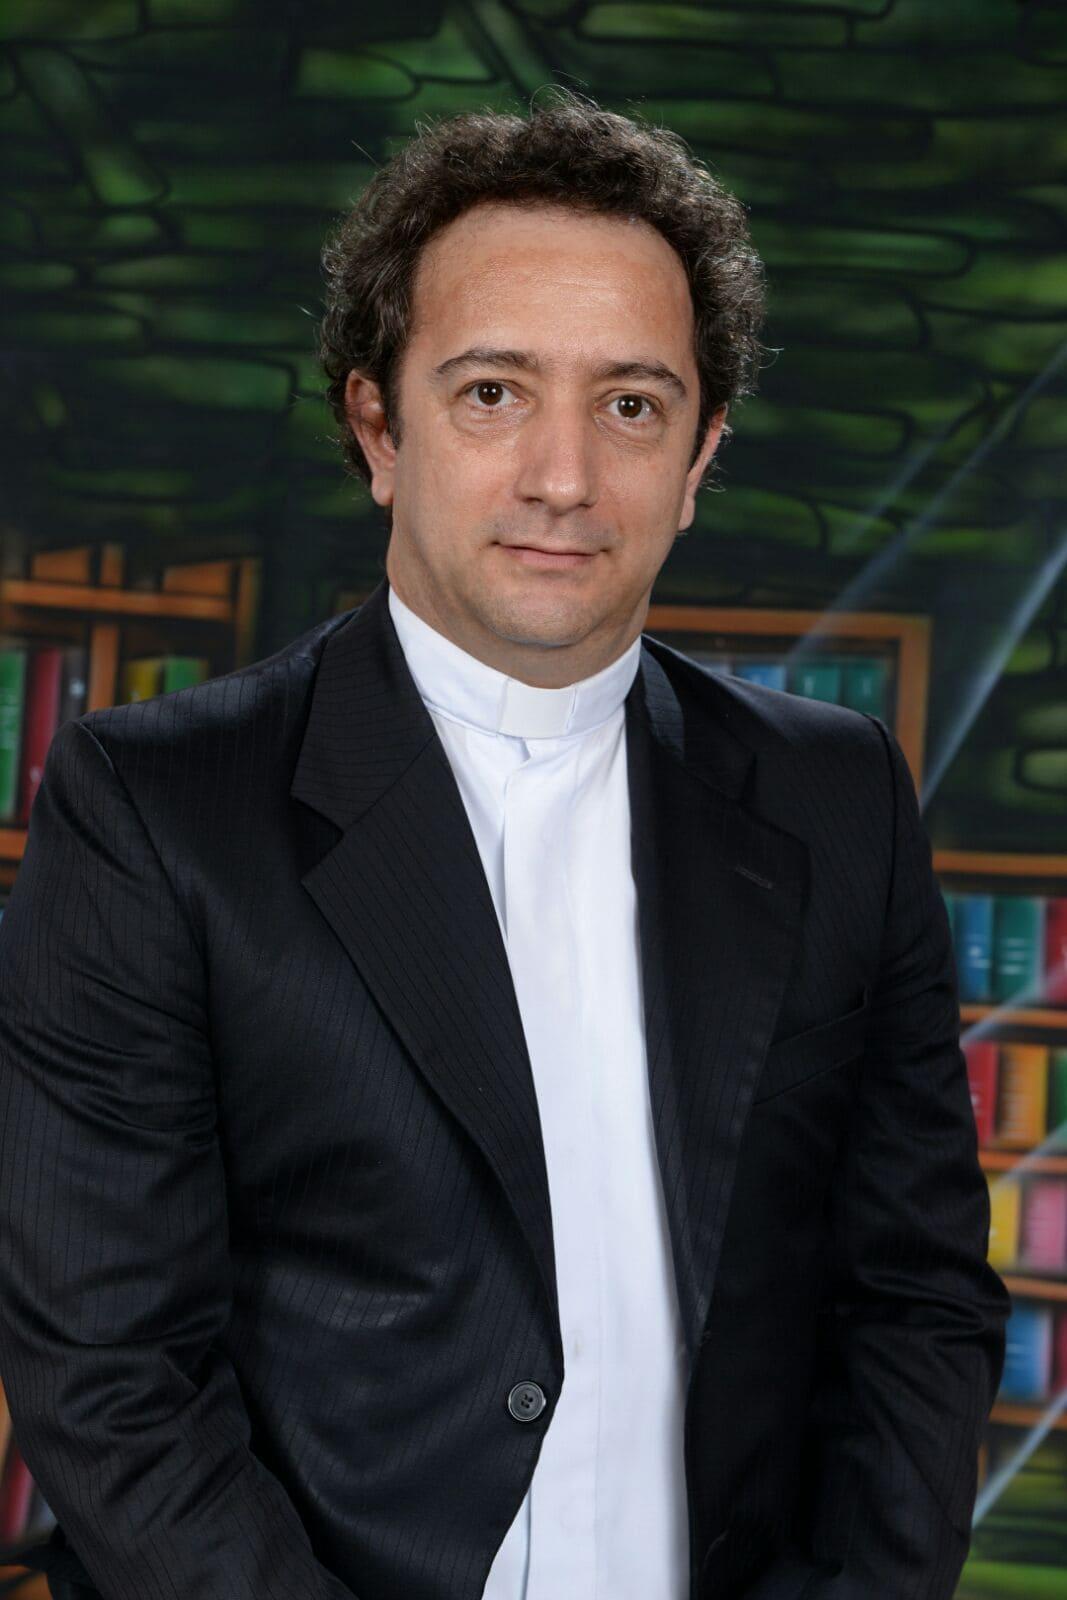 Homenaje póstumo Pbro. Jorge Iván Ramírez Aguirre.IUSH